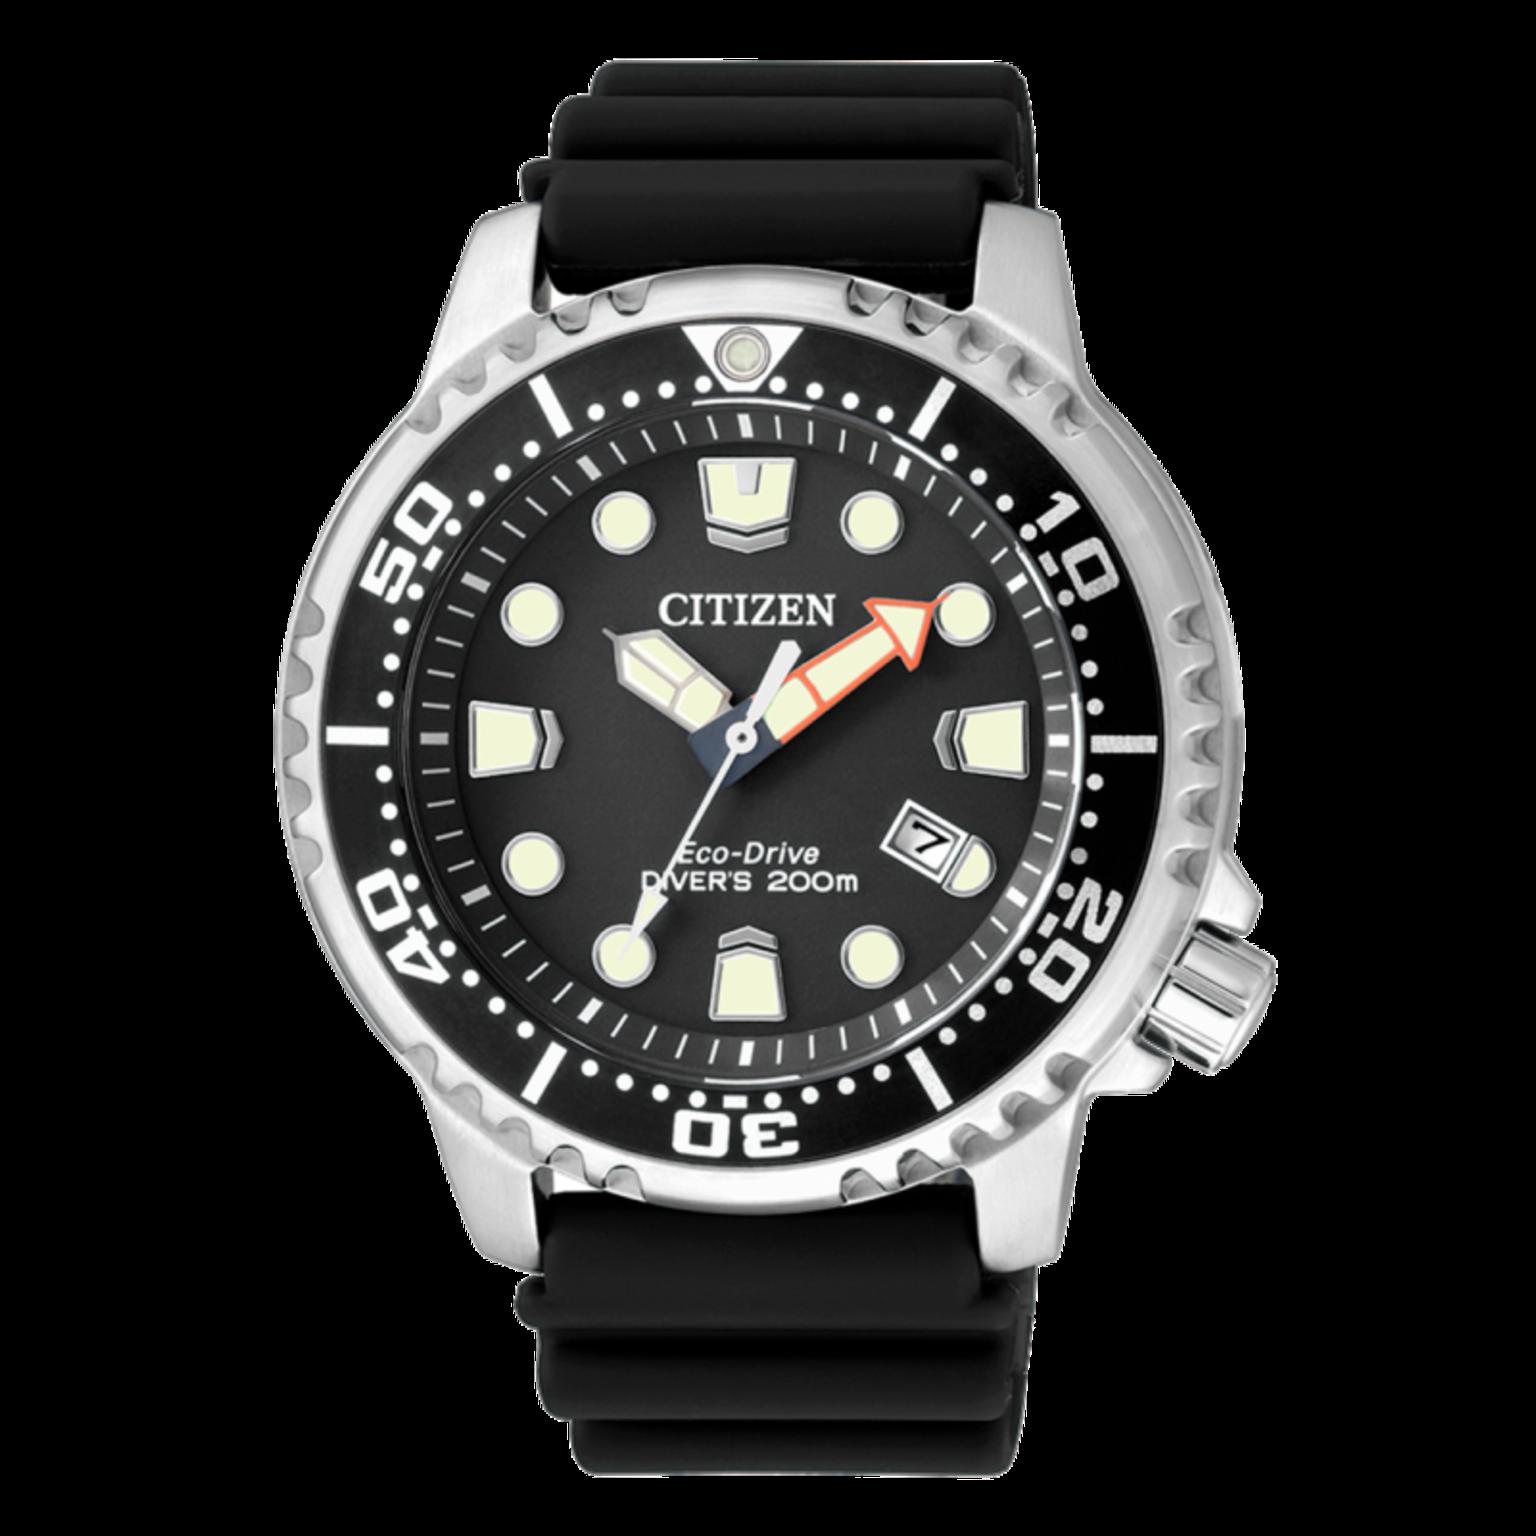 Citizen Promaster Ecodrive watch